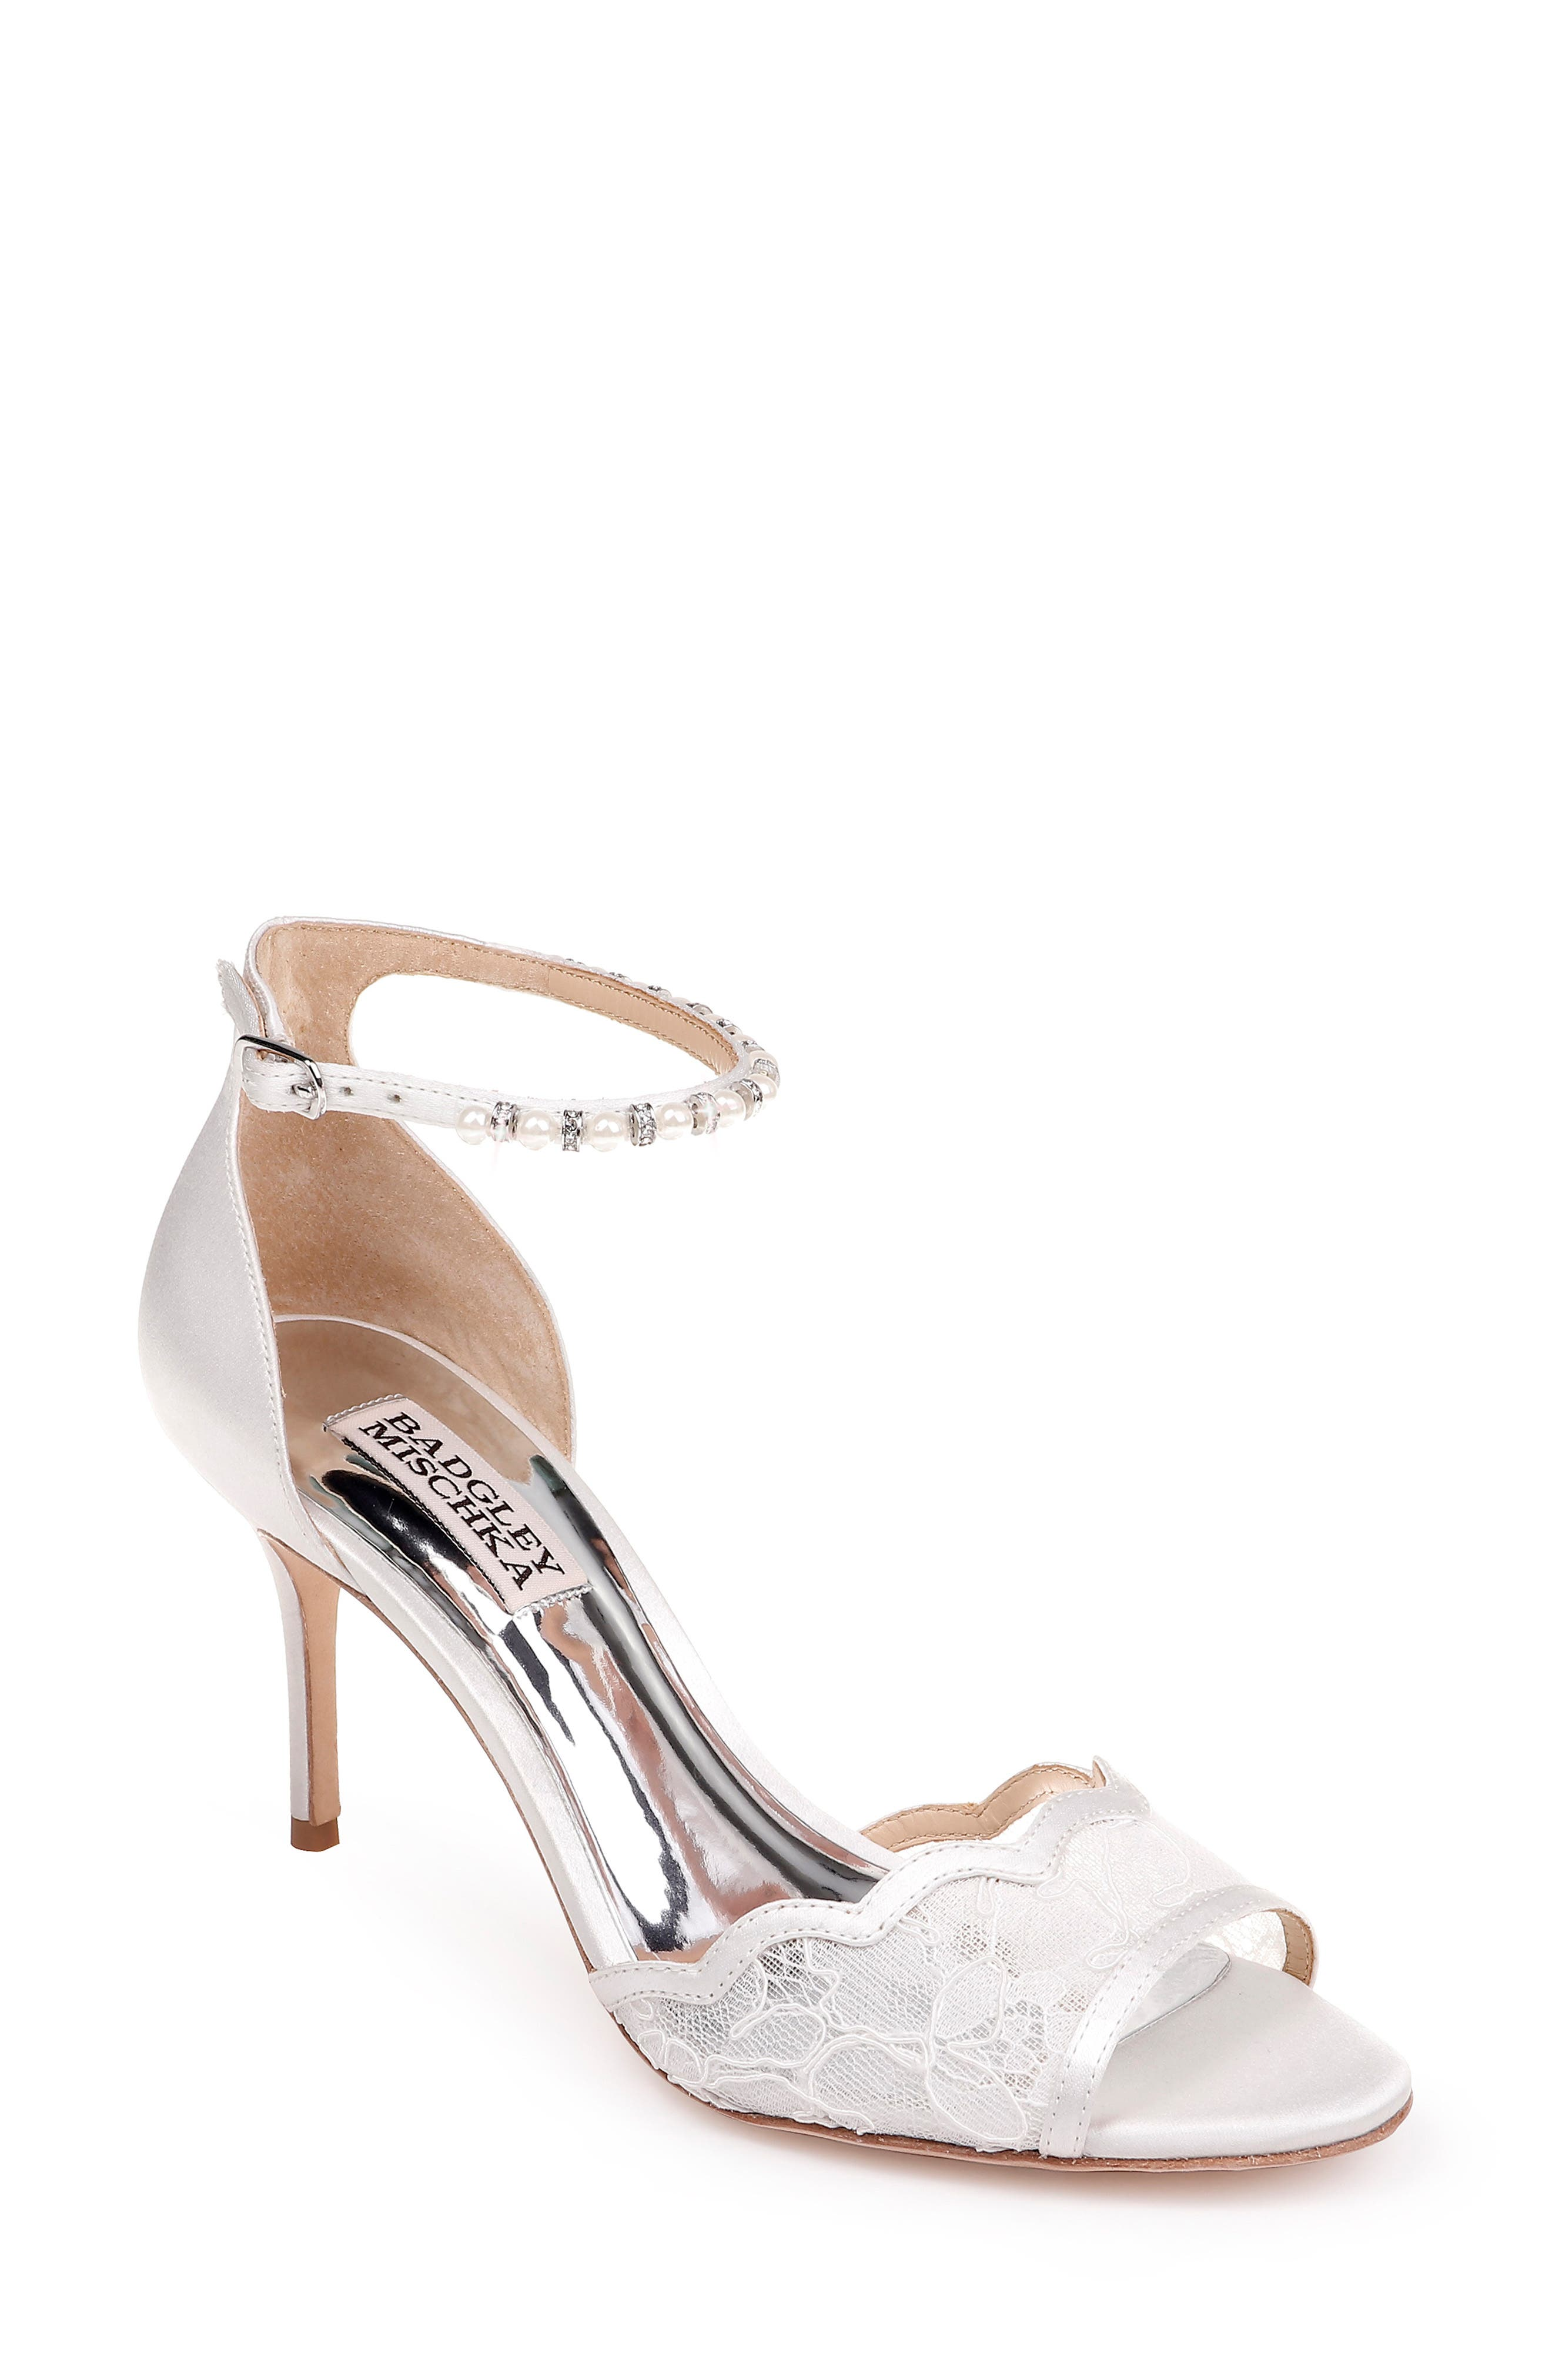 BADGLEY MISCHKA COLLECTION Badgley Mischka Lenora Ankle Strap Sandal, Main, color, SOFT WHITE FABRIC/ SATIN